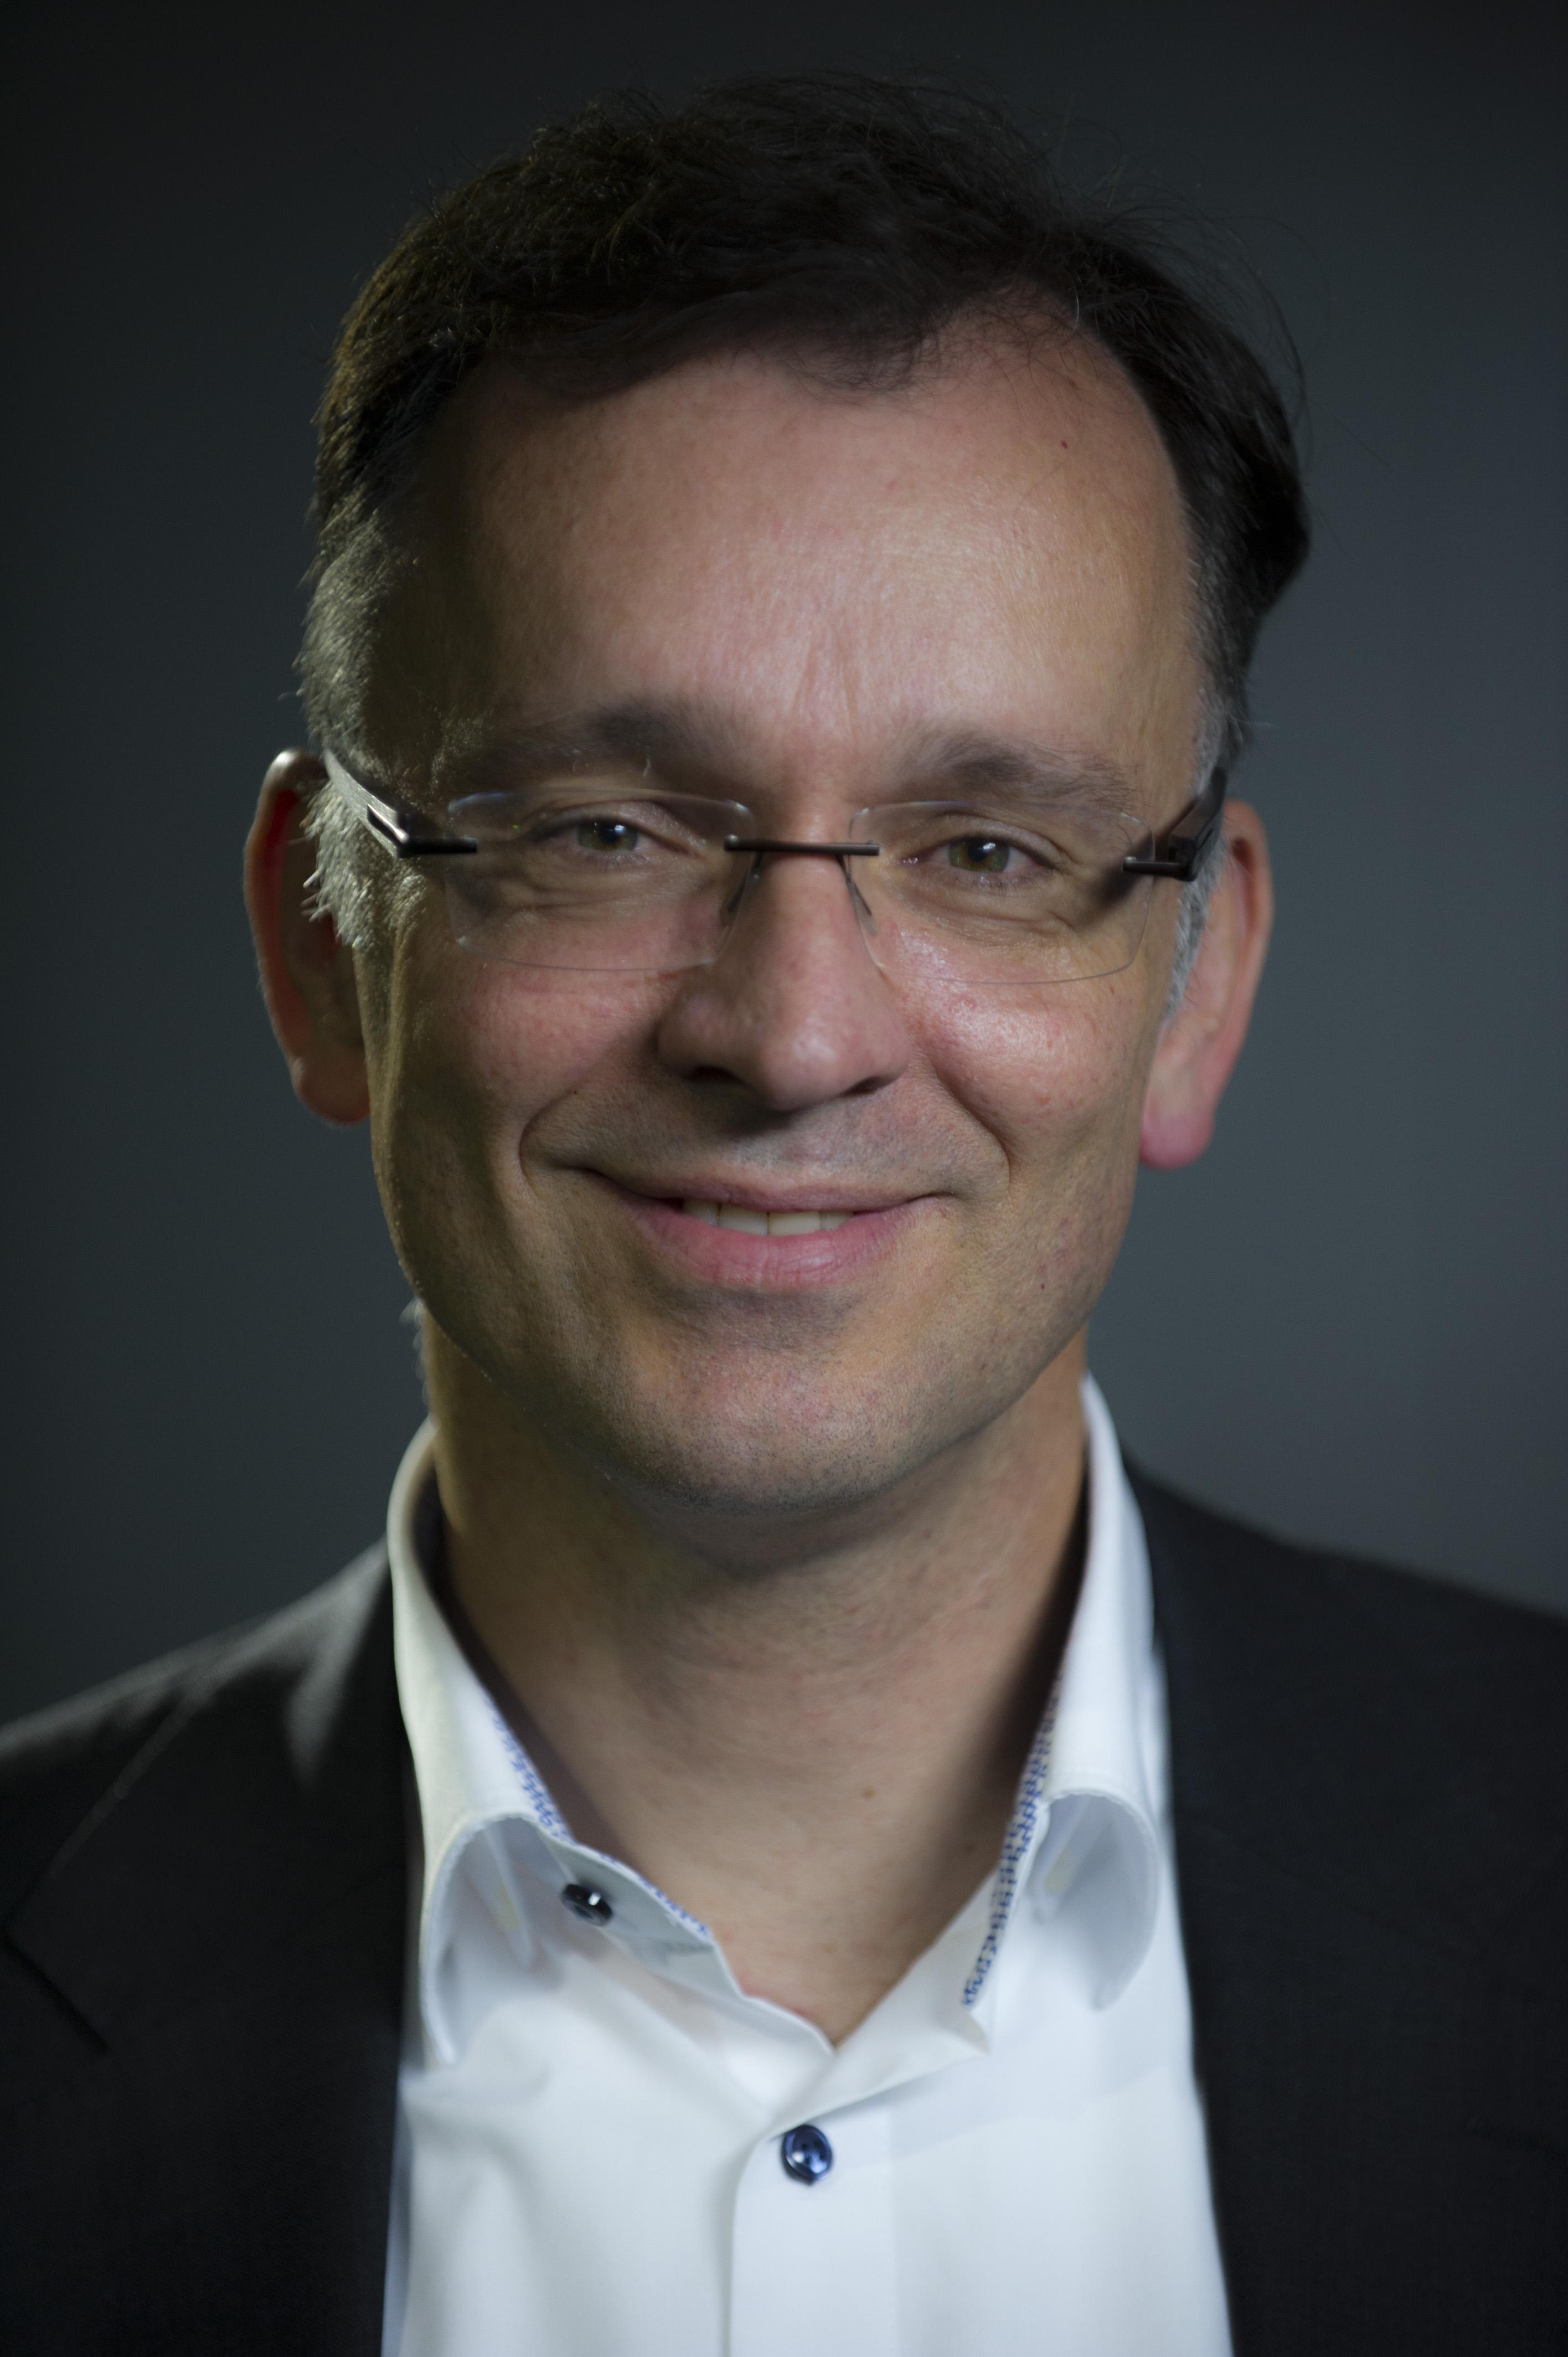 Bernhard Hufenbach